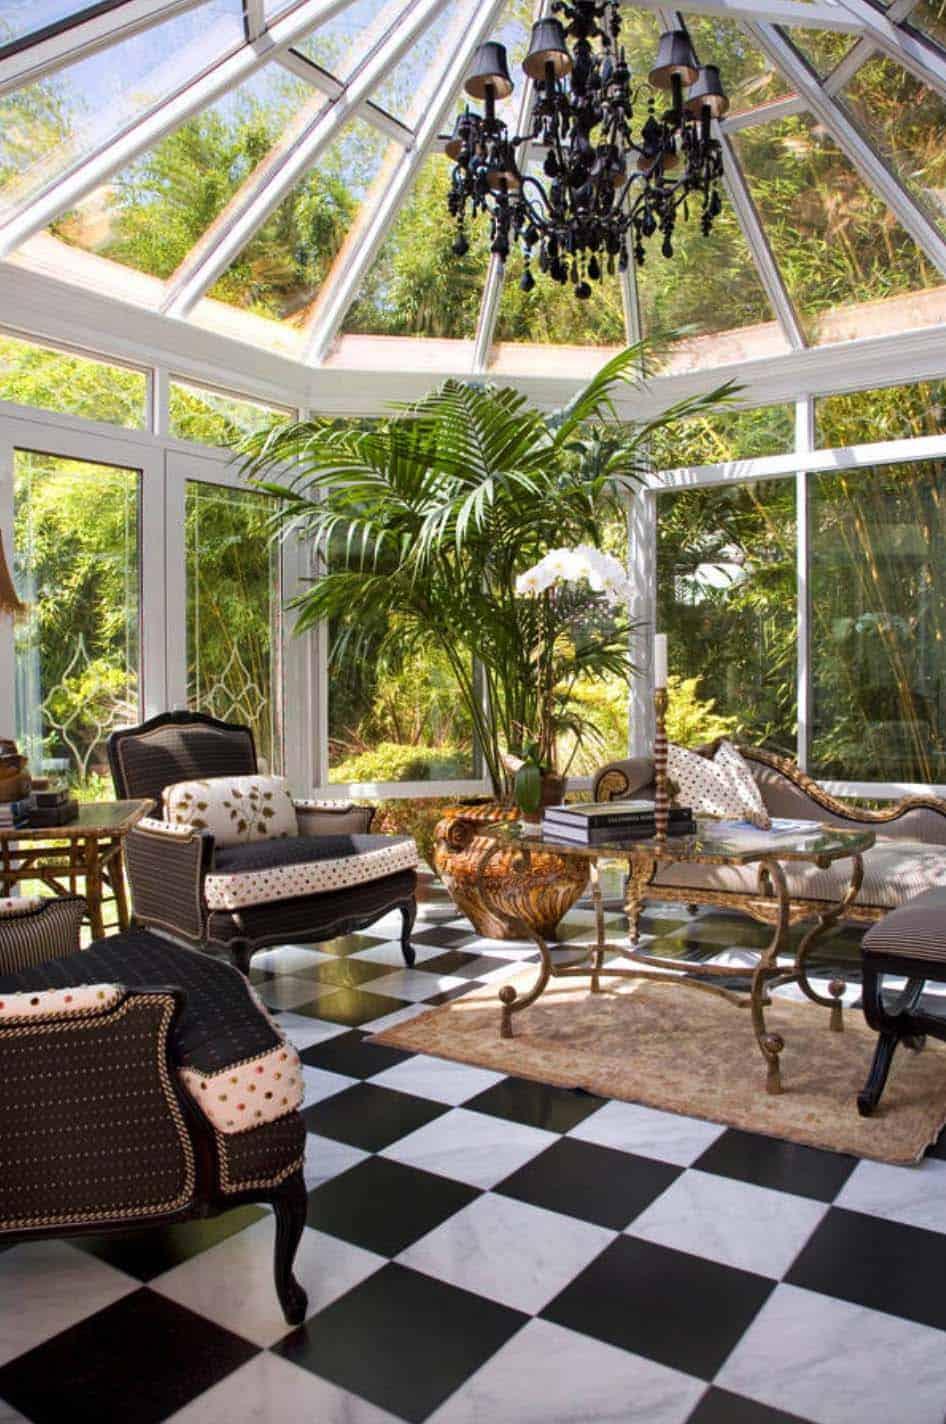 Amazing-Conservatory-Greenhouse-Ideas-25-1-Kindesign